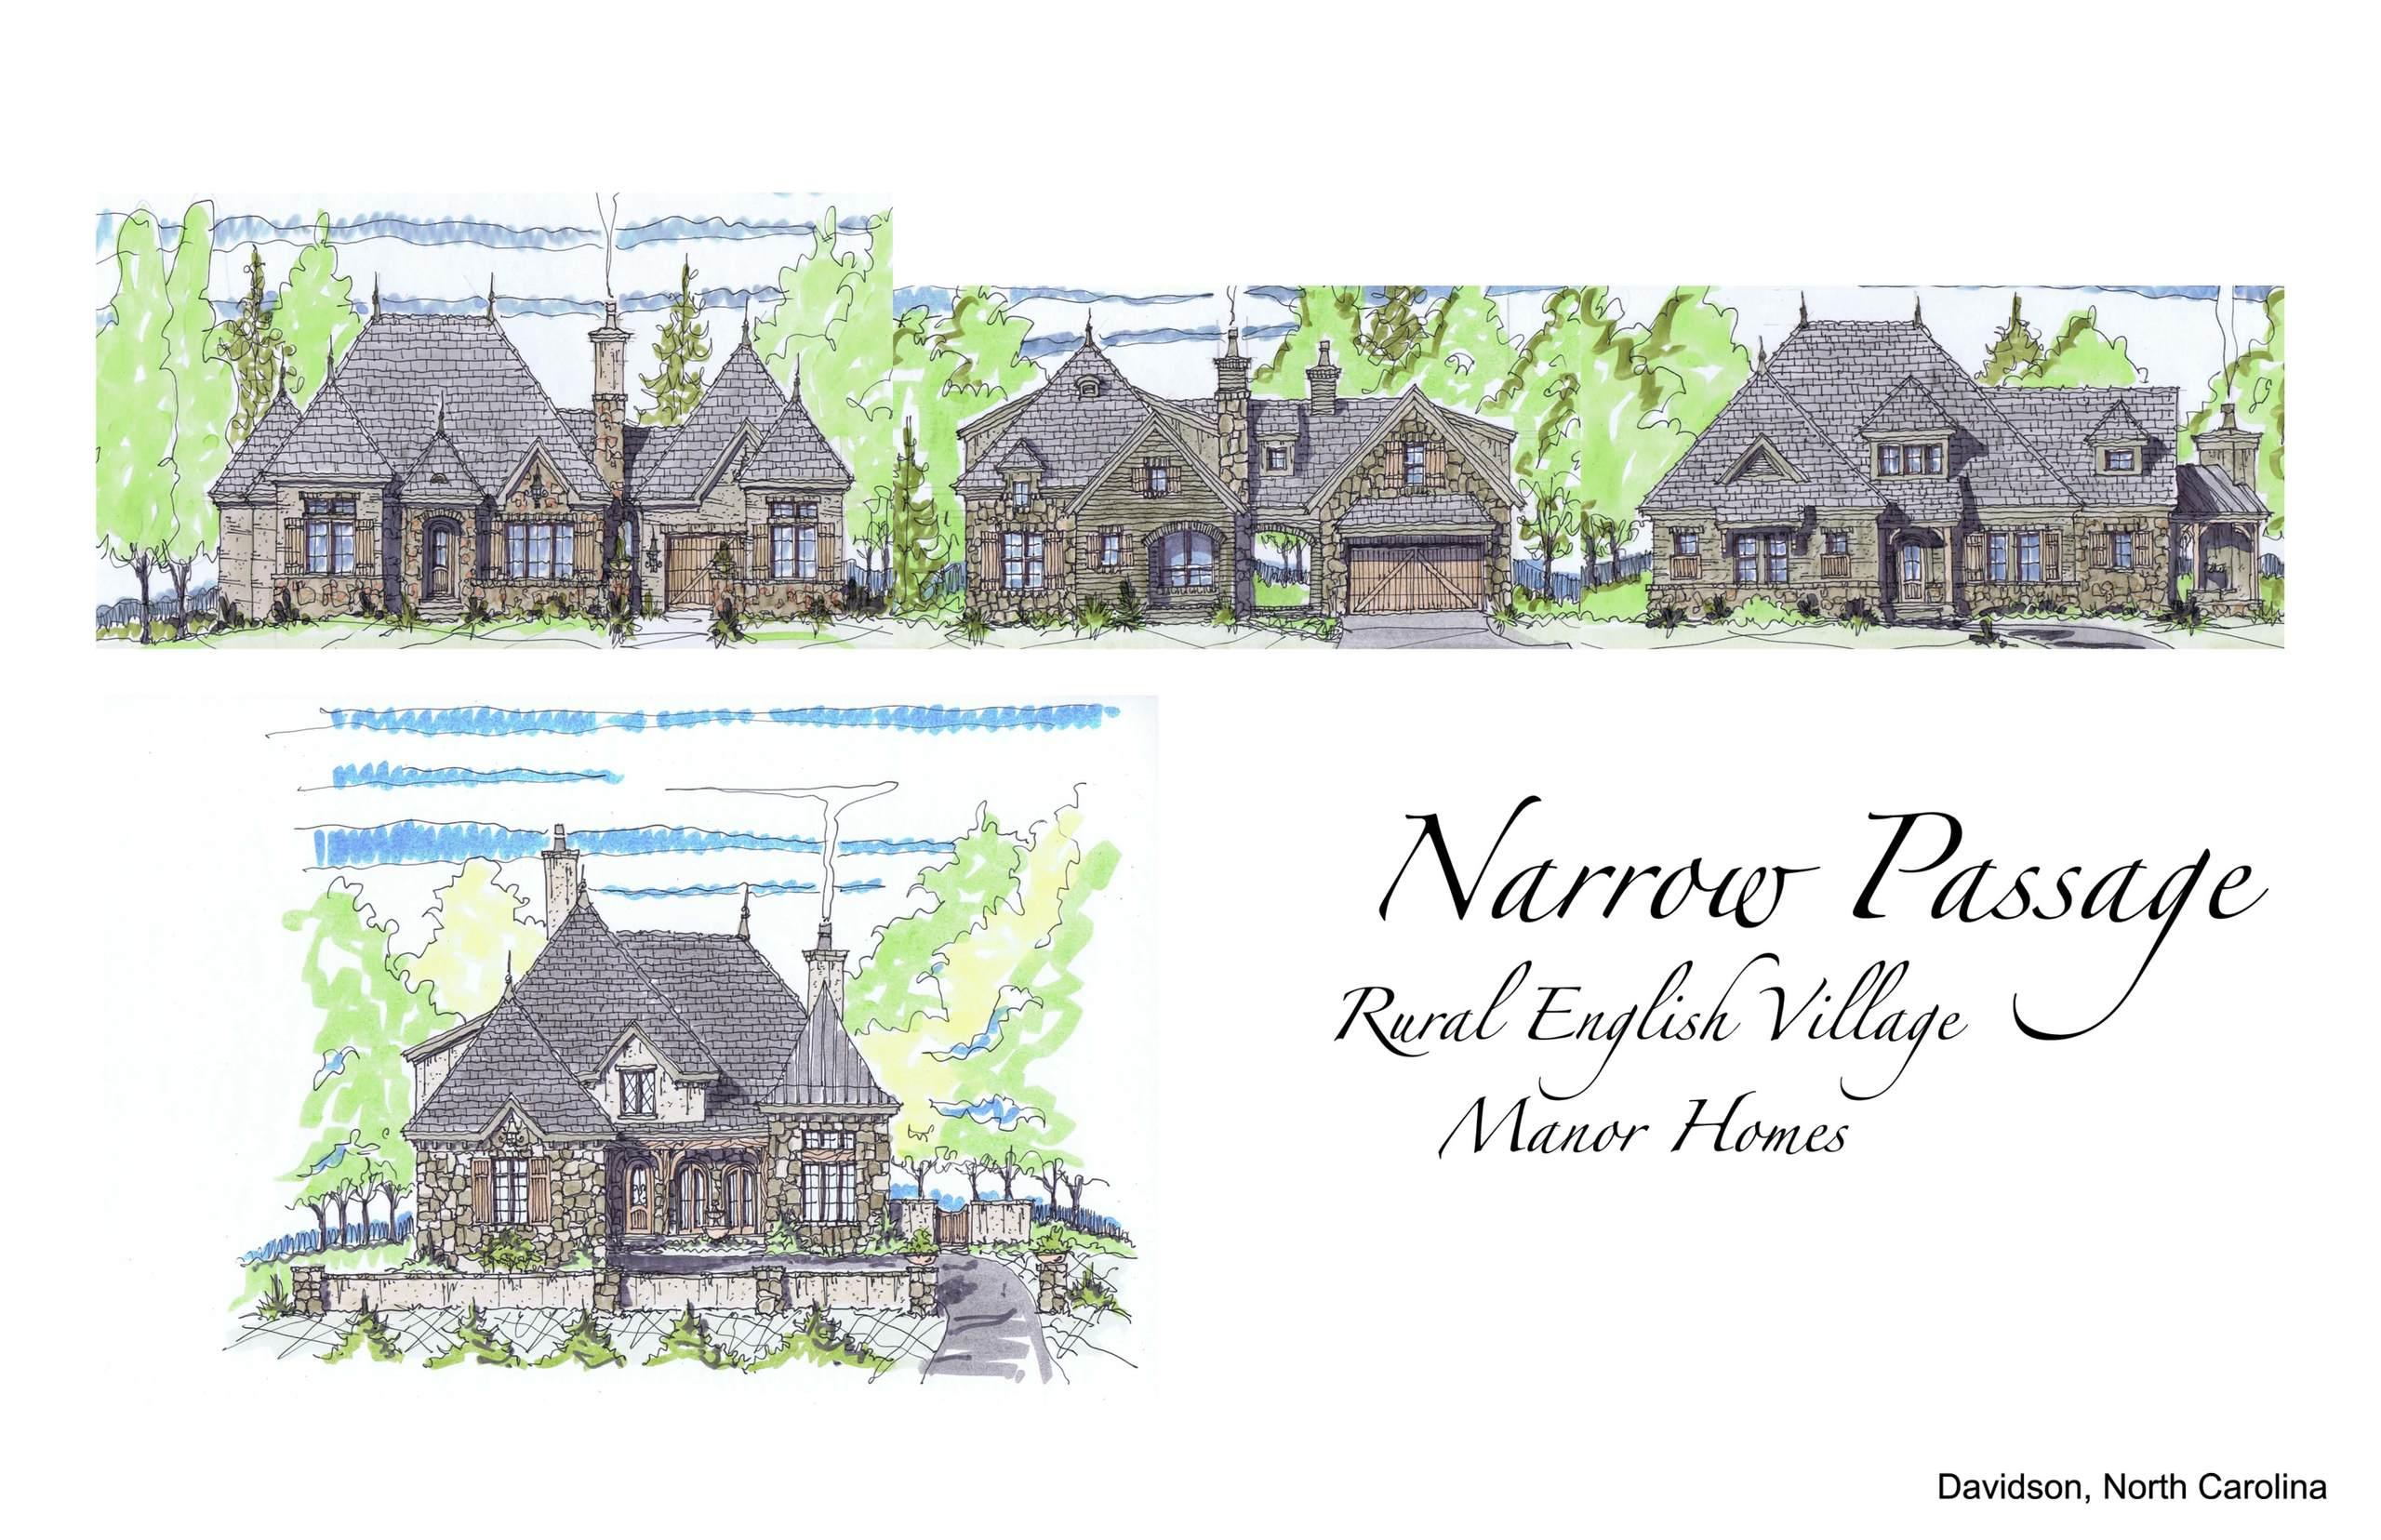 Narrow Passage Manor Homes